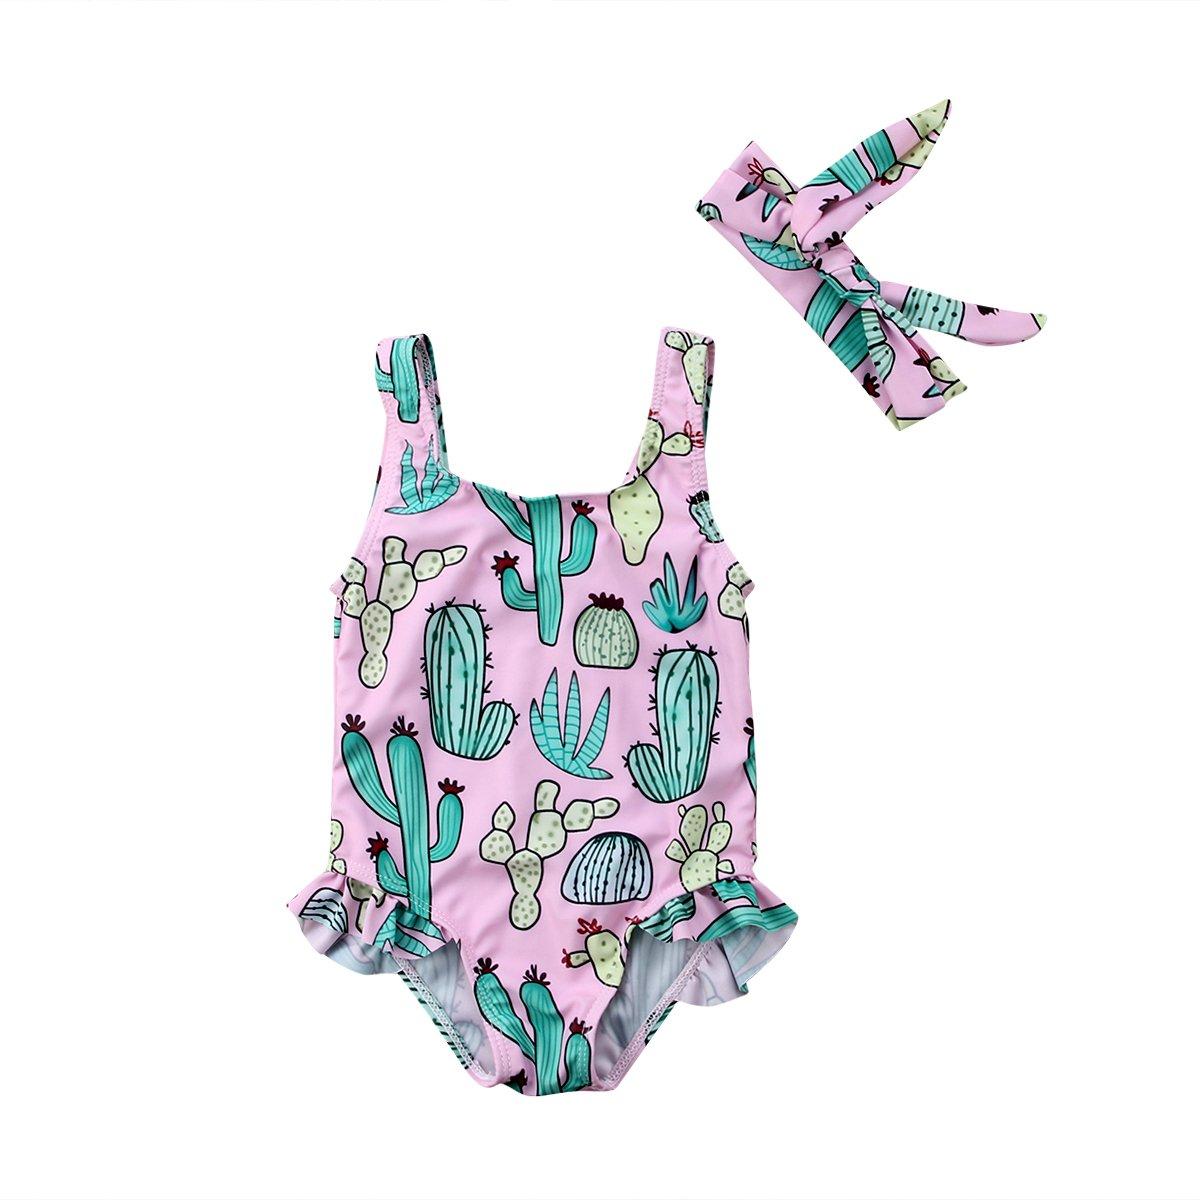 ITFABS Newborn Baby Girl Cactus Swimsuit Ruffles Bathing Suit Bikini Floral Swimwear with Headband for Baby Girls Beach Wear